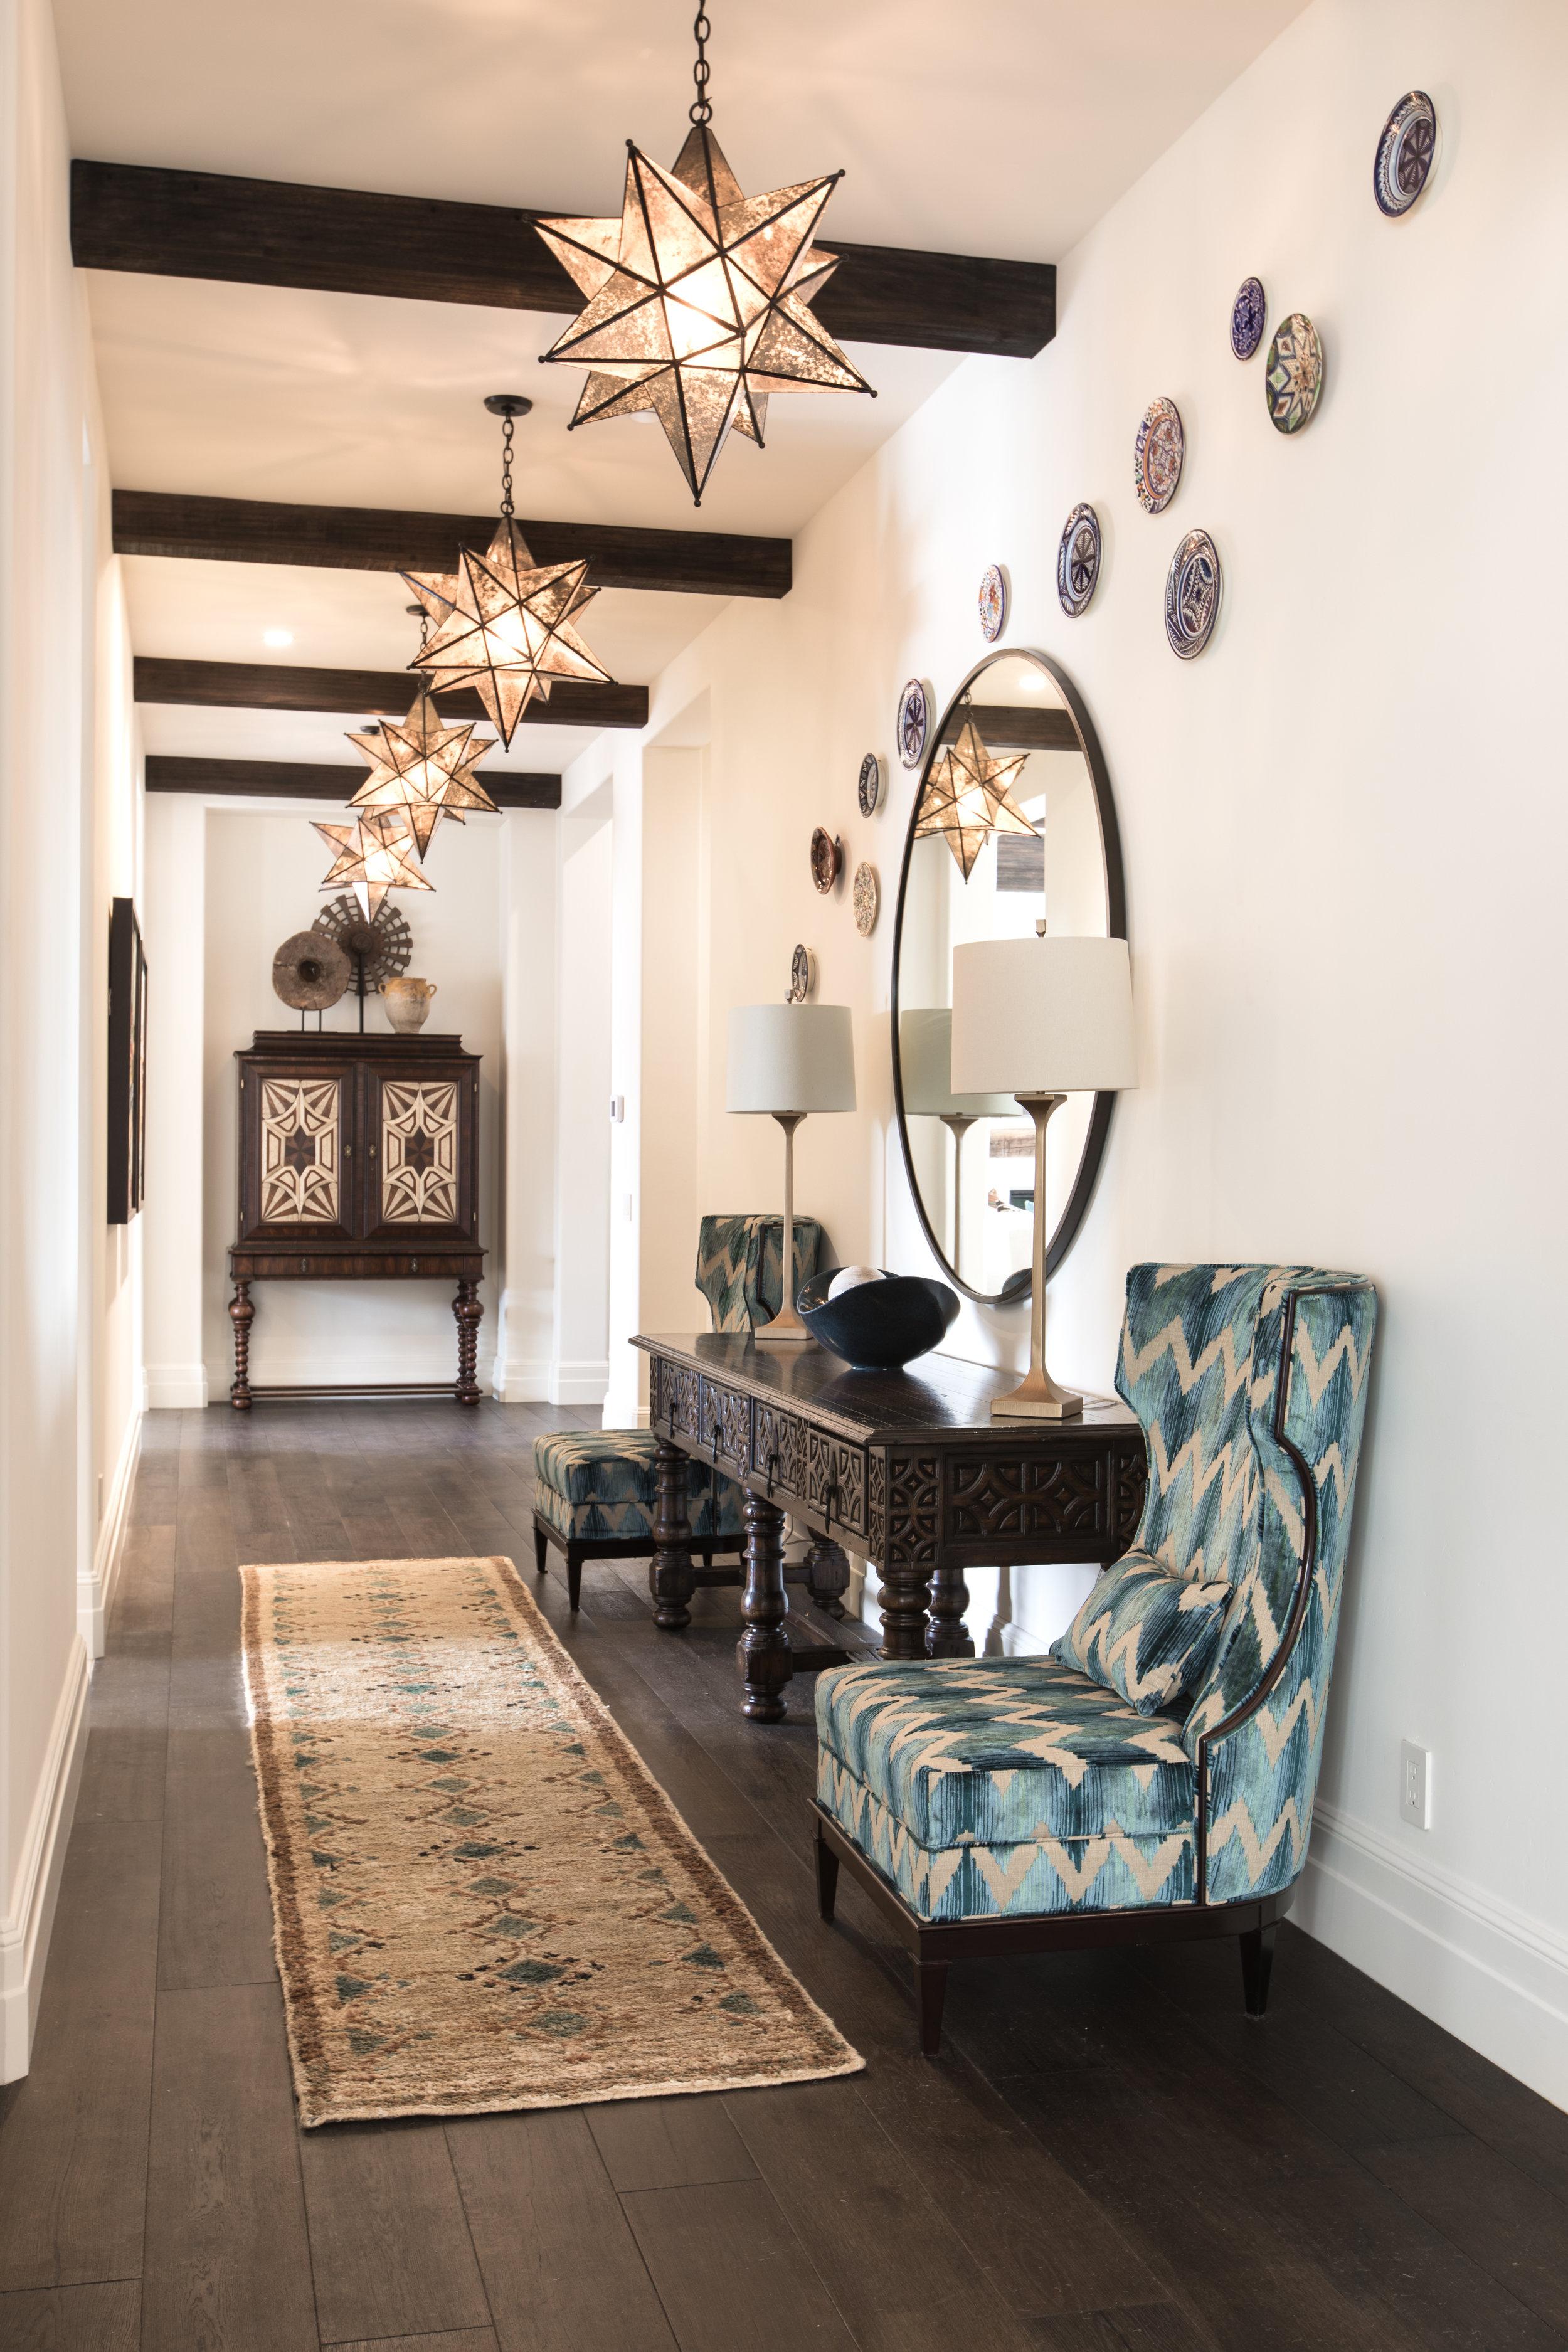 Hilltop Hacienda by Denise Morrison Interiors, Main Floor Hallway